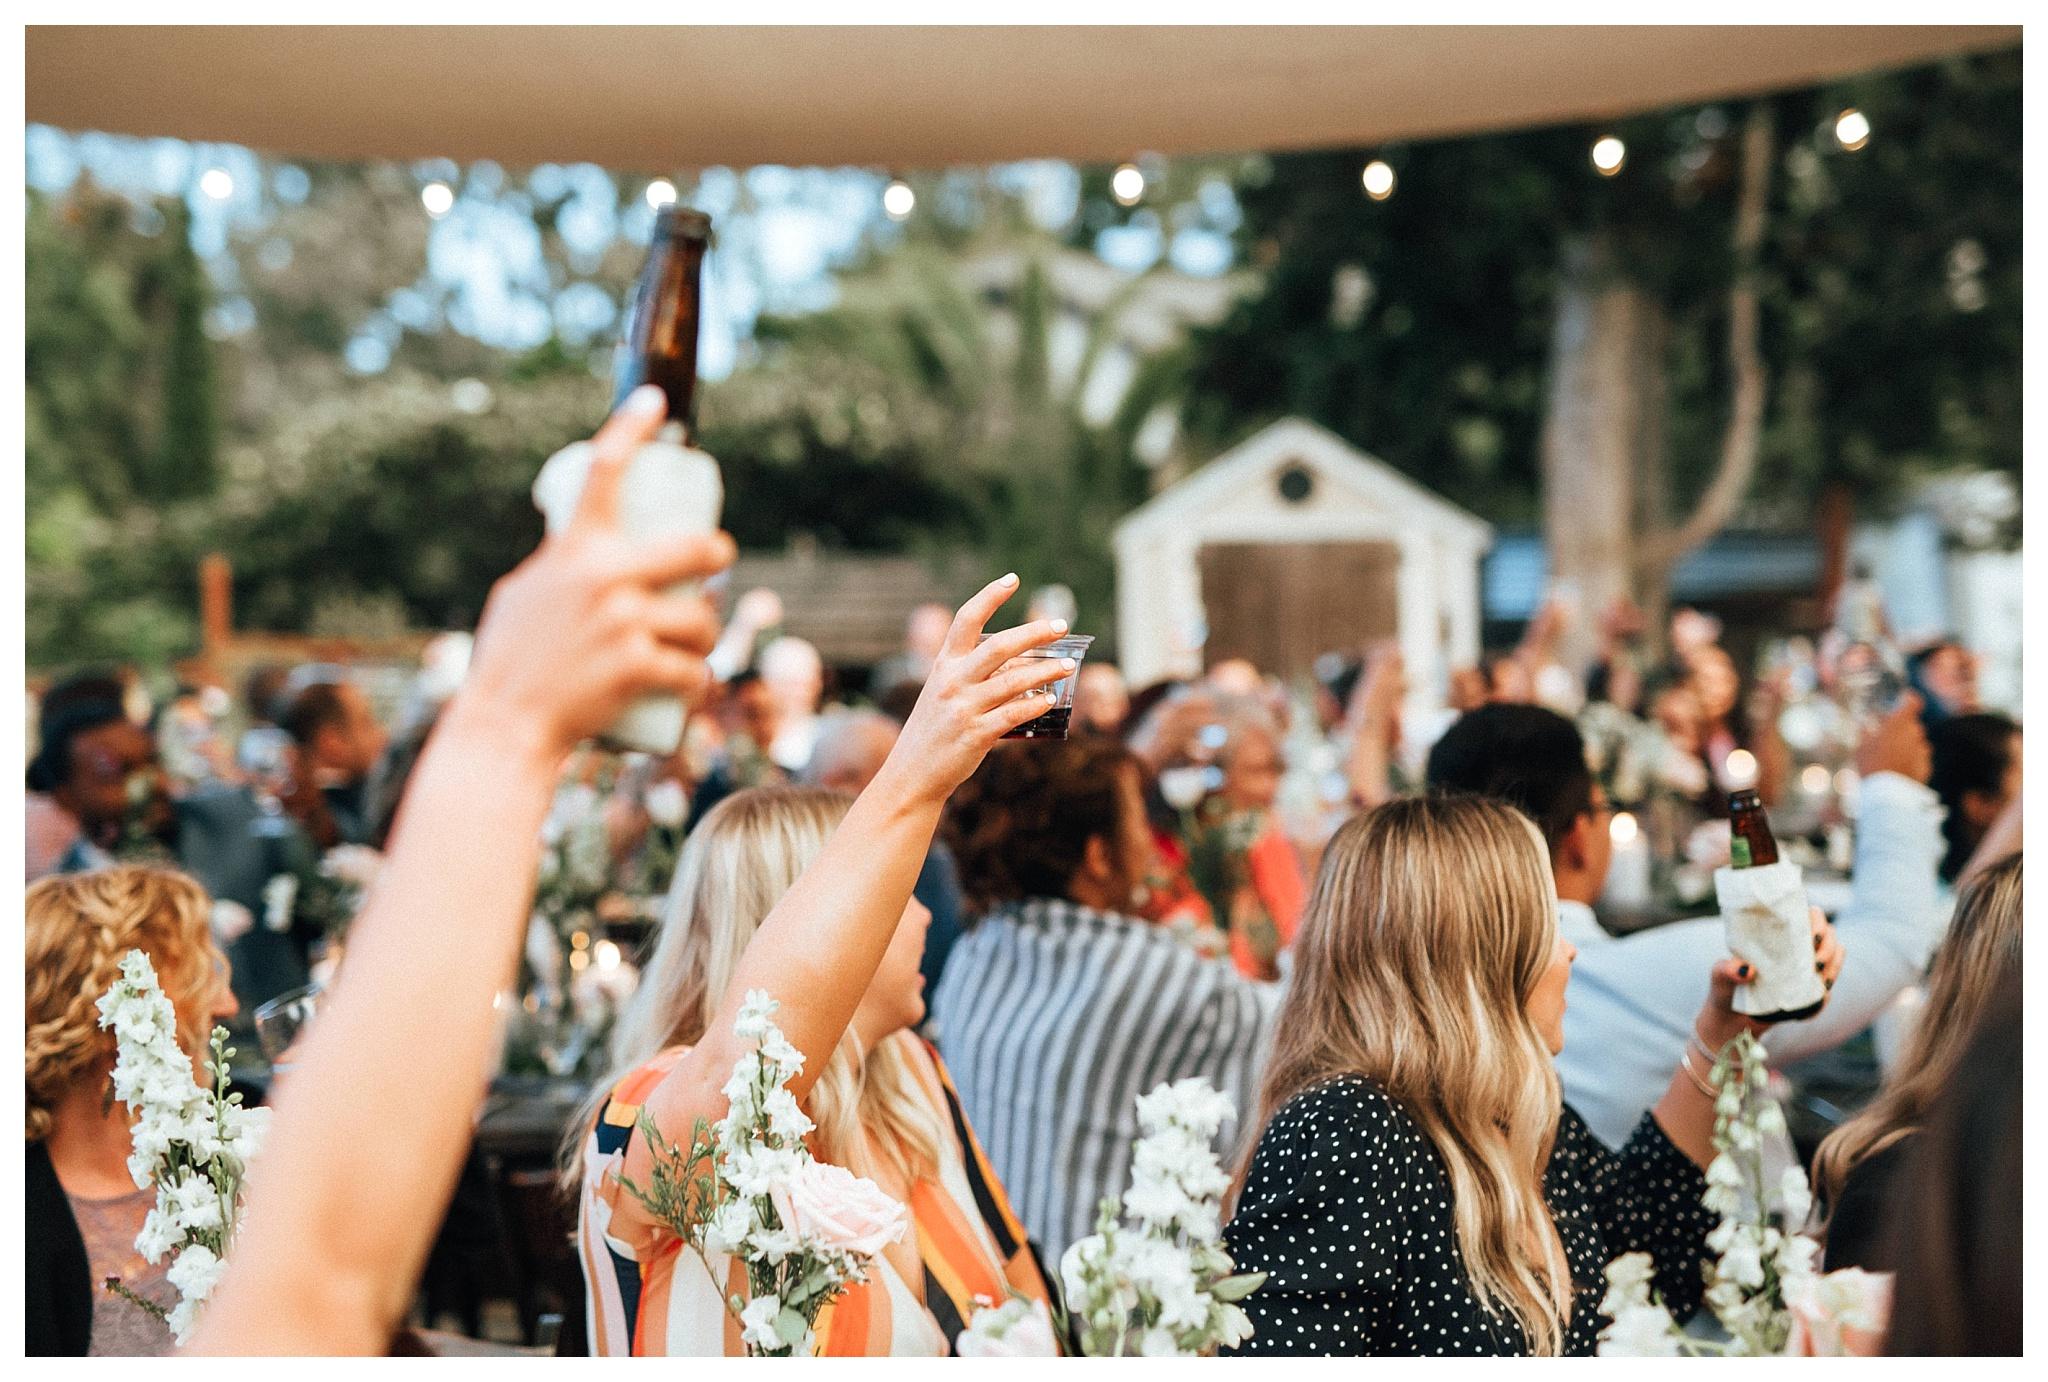 BarrelsandBrancheswedding_0073.jpg